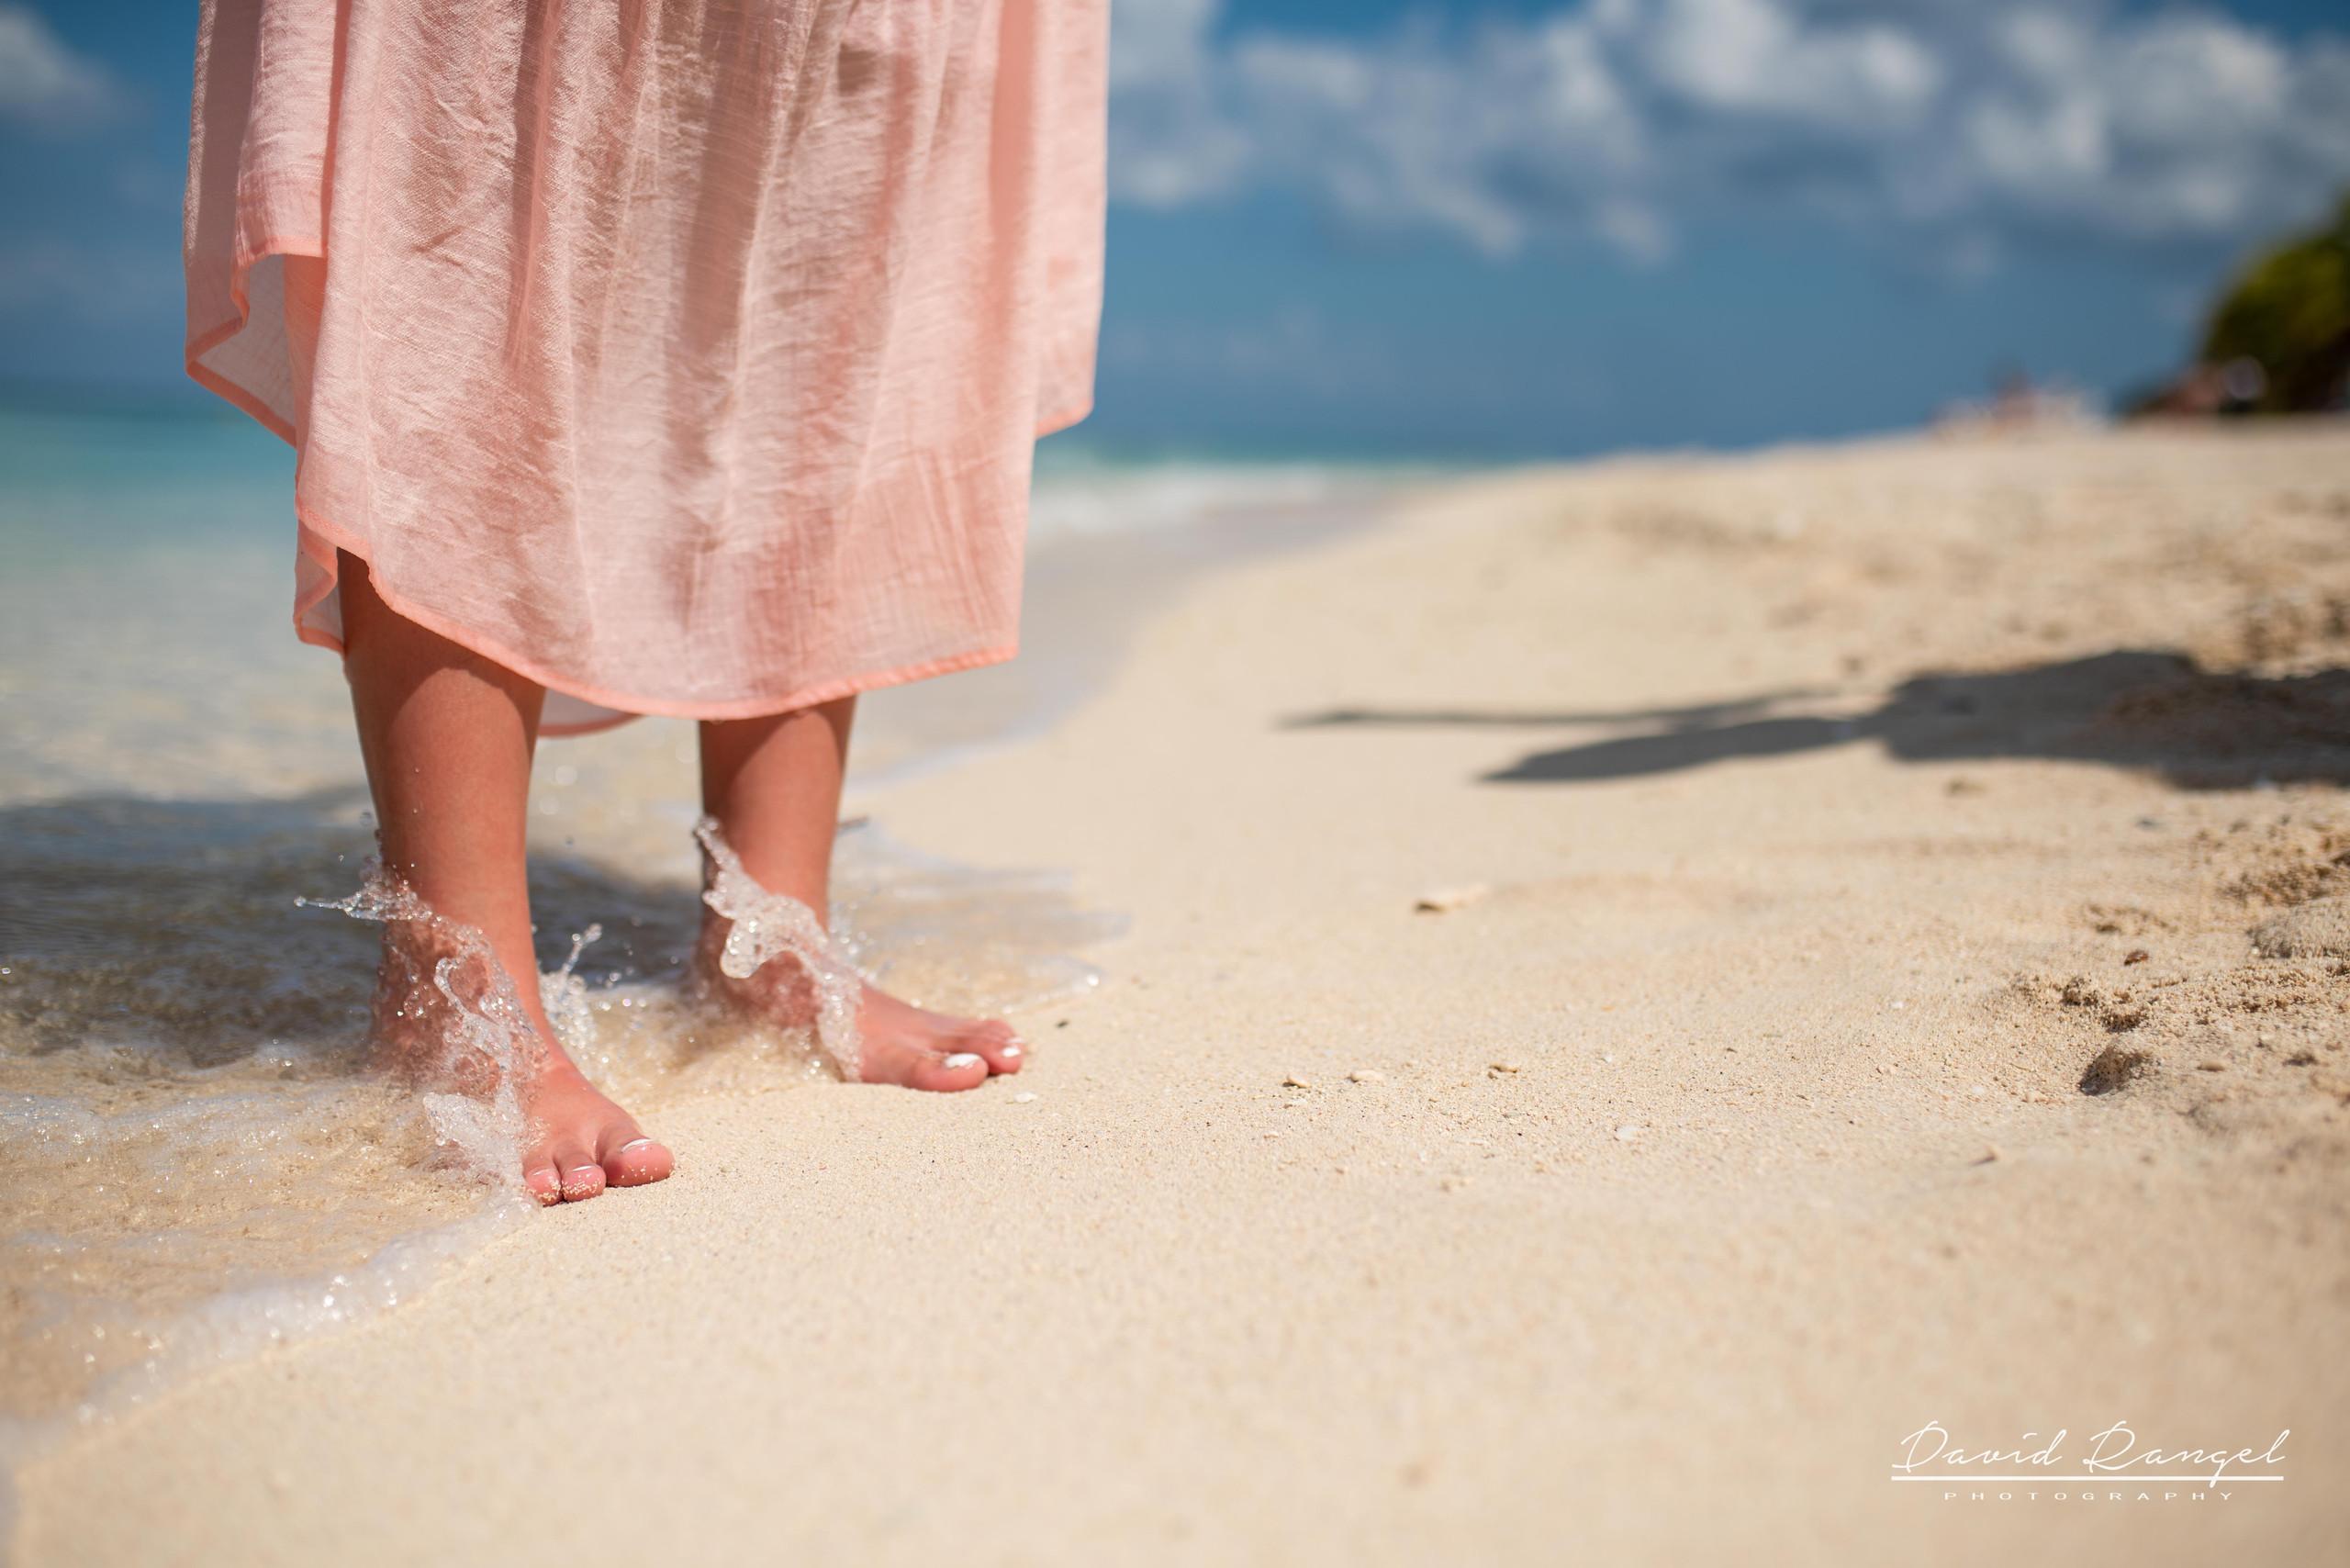 daughter+session+beach+cozumel+island+photo+destination+photographer+feet+play+water+pier+paradise+happy